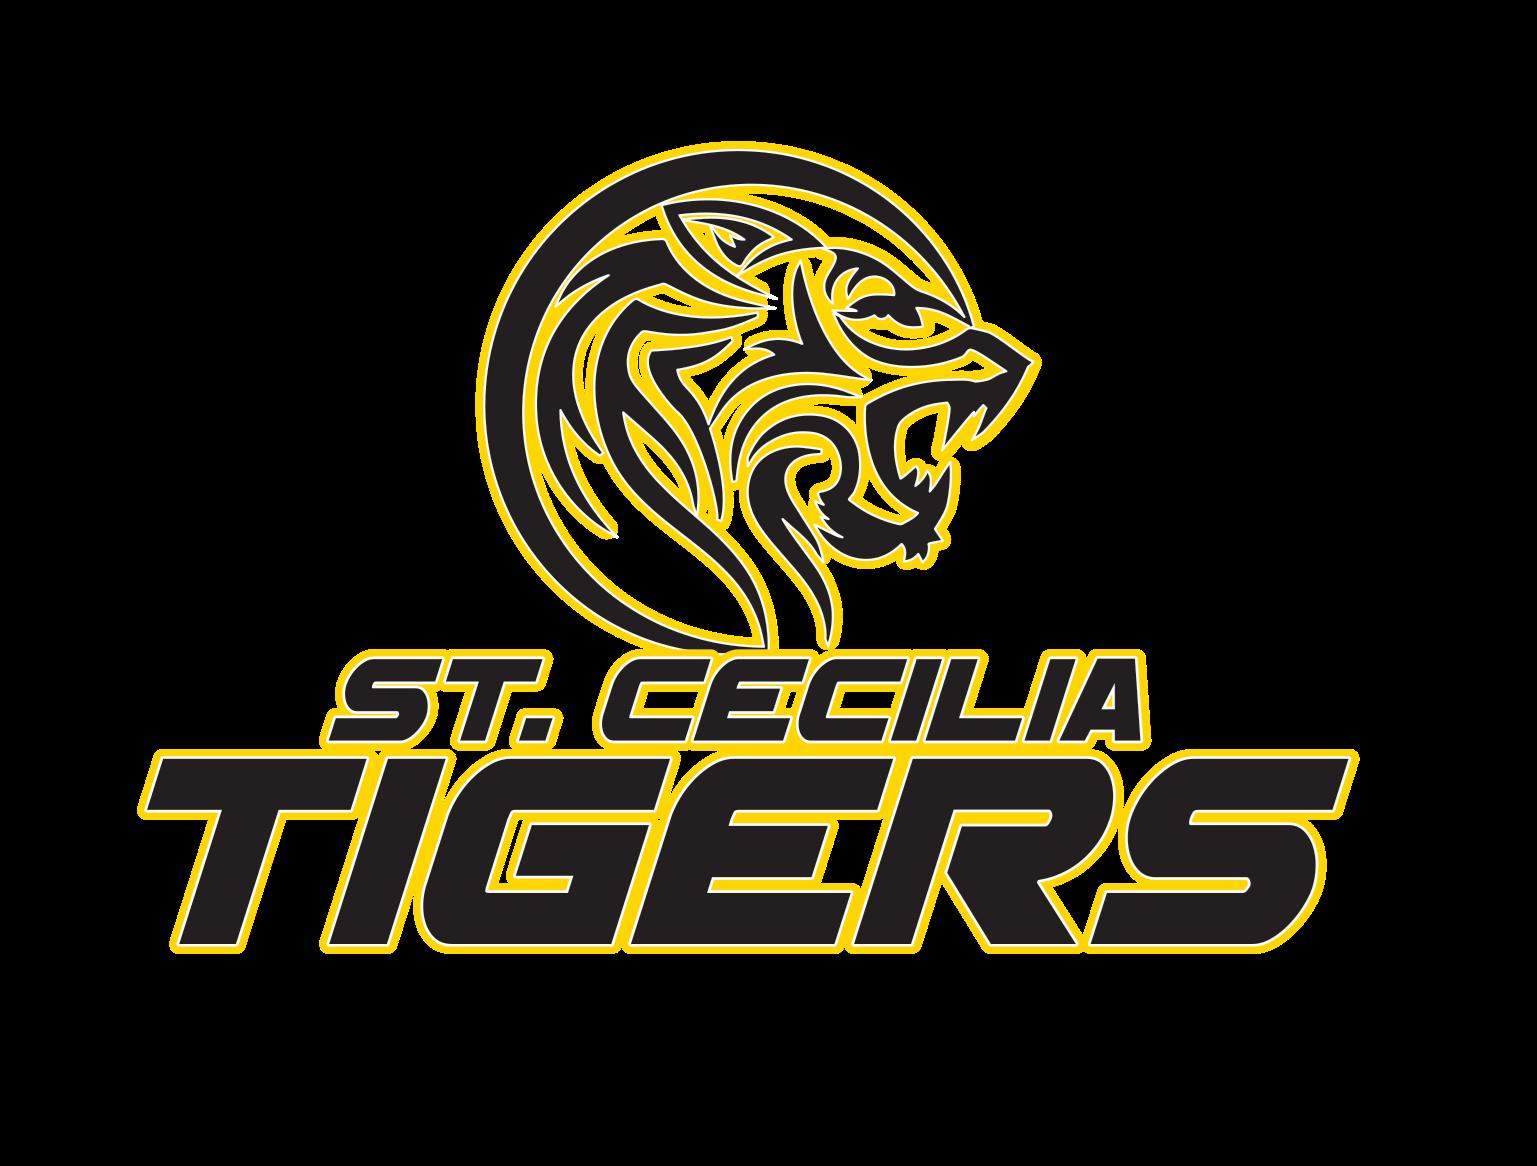 ST CECILIA TIGER LOGO [c].png